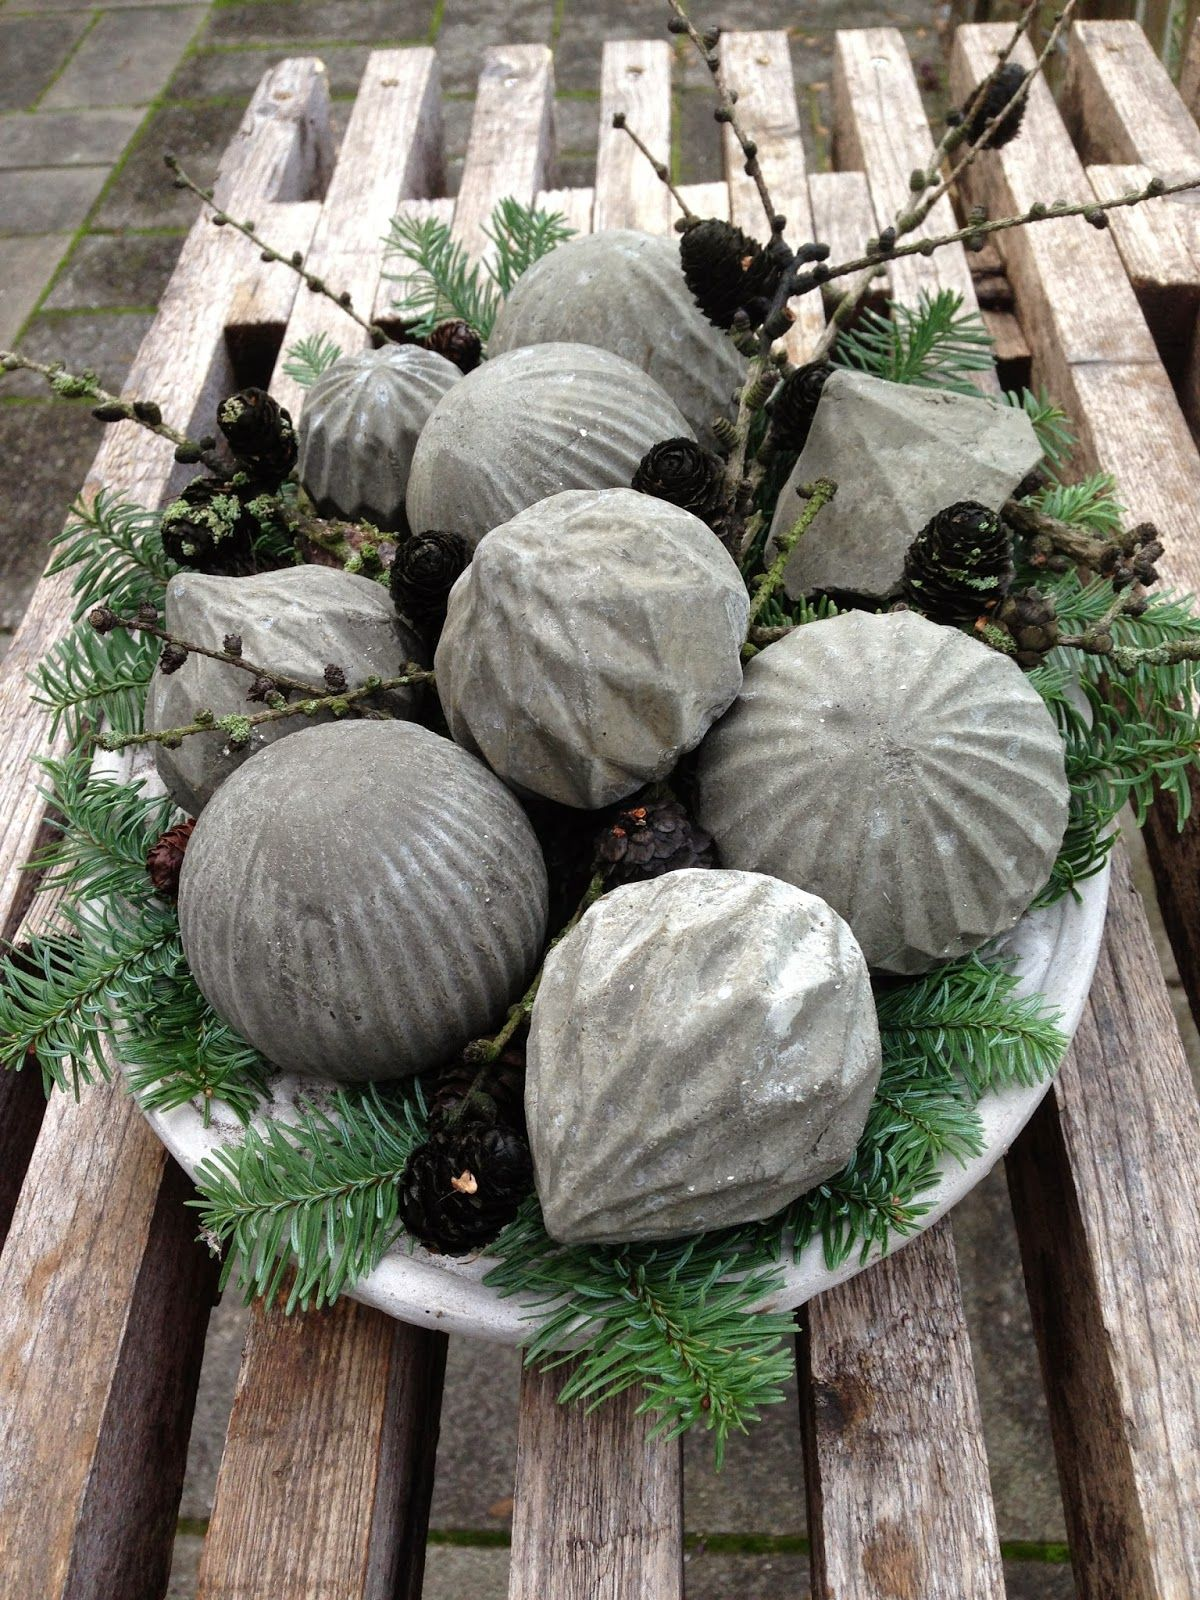 Fru Pedersens have DIY Beton julekugler Christmas tree ornaments